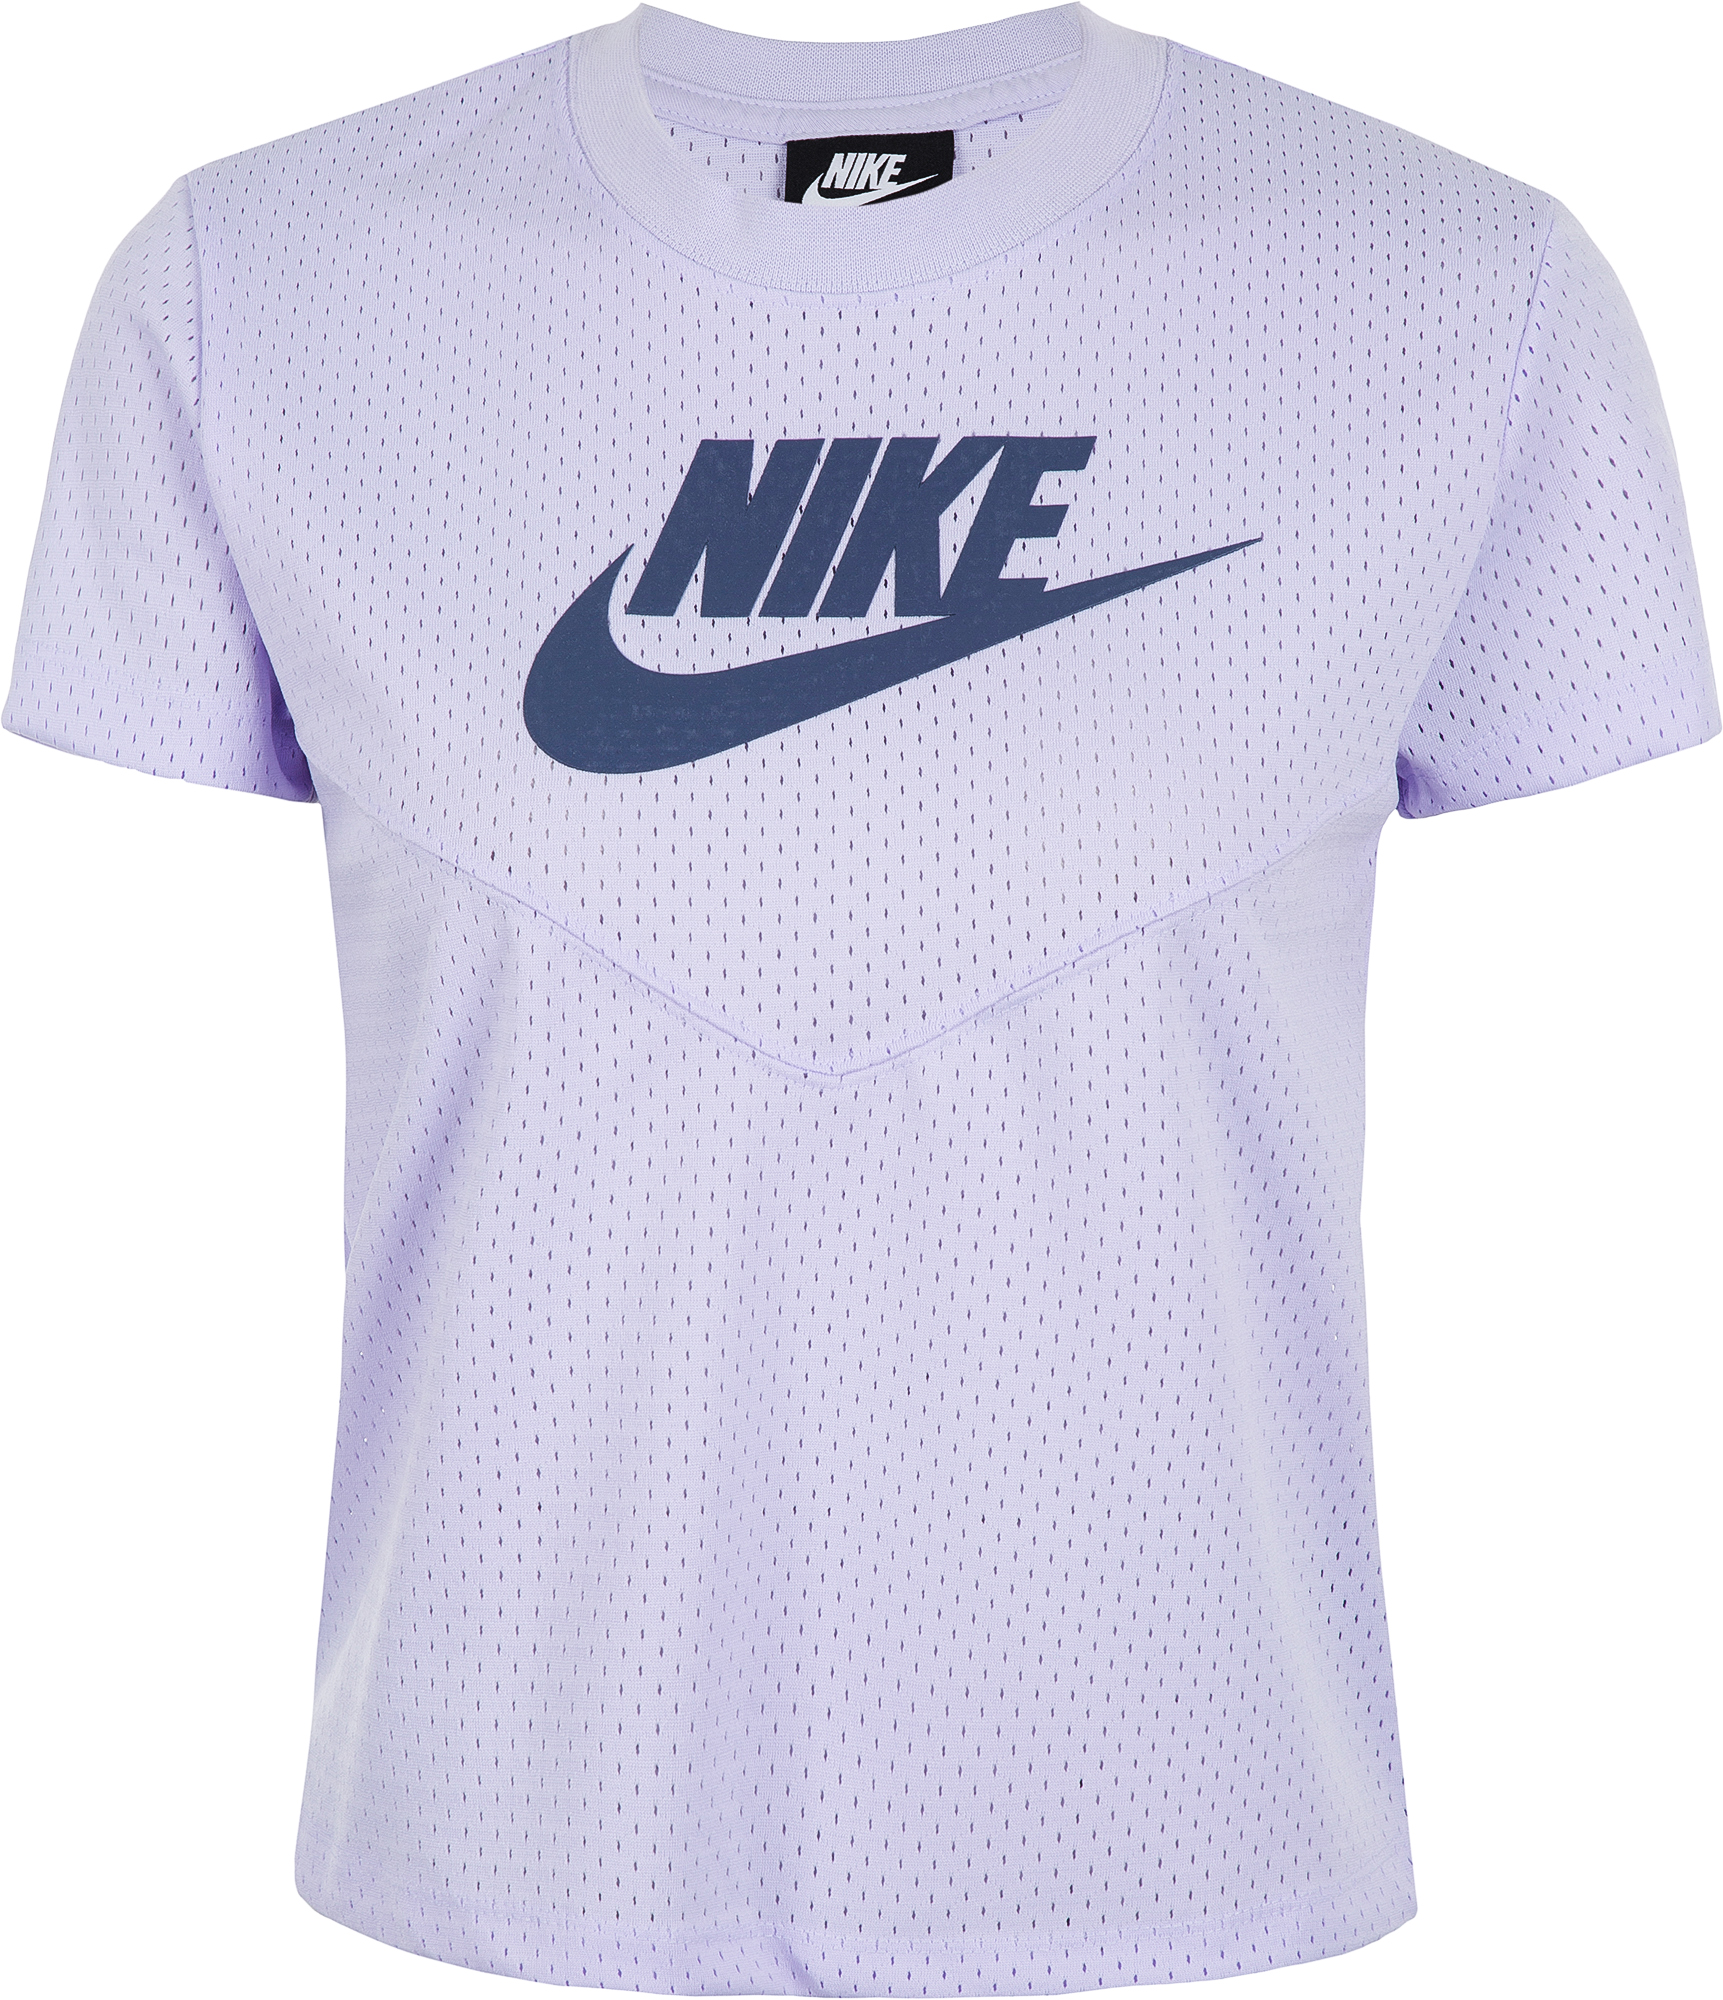 цена Nike Футболка женская Nike Heritage, размер 42-44 онлайн в 2017 году